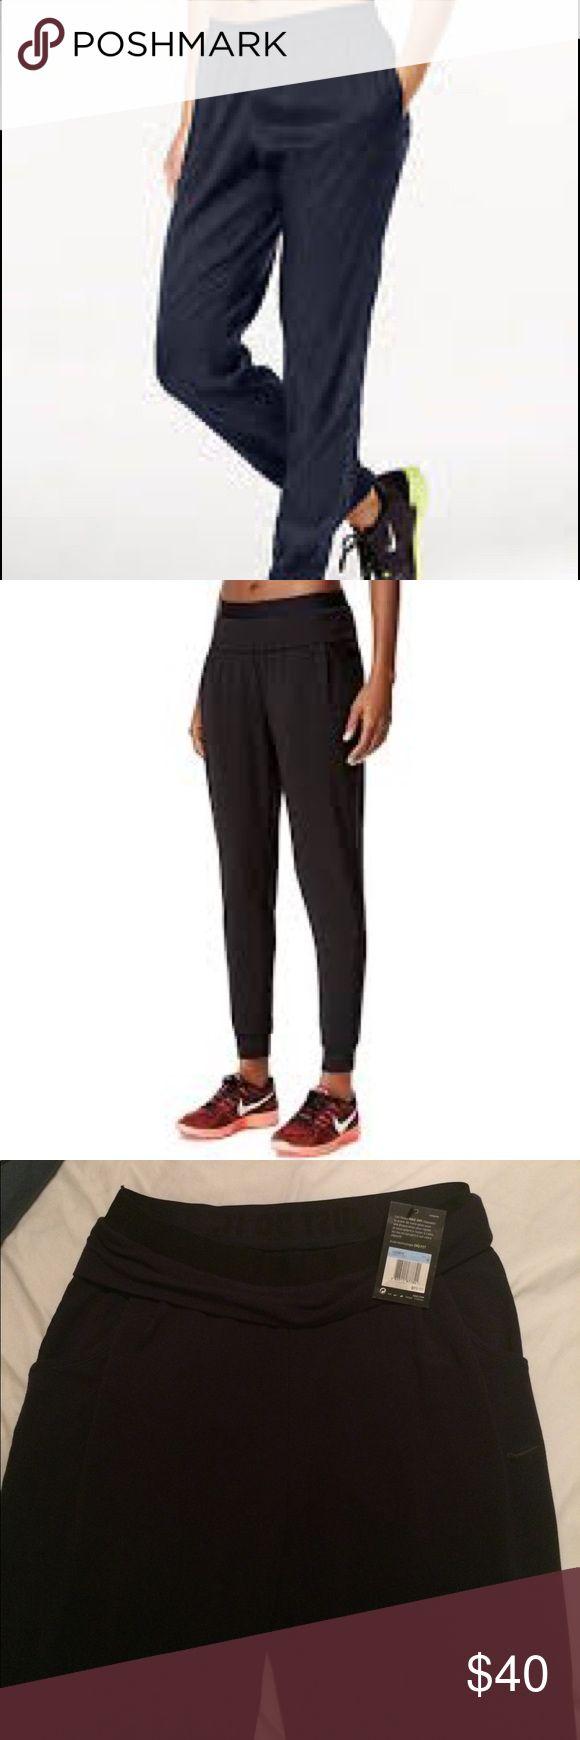 Nike training pants Womens Nike training jogger pant with pockets Nike Pants Track Pants & Joggers